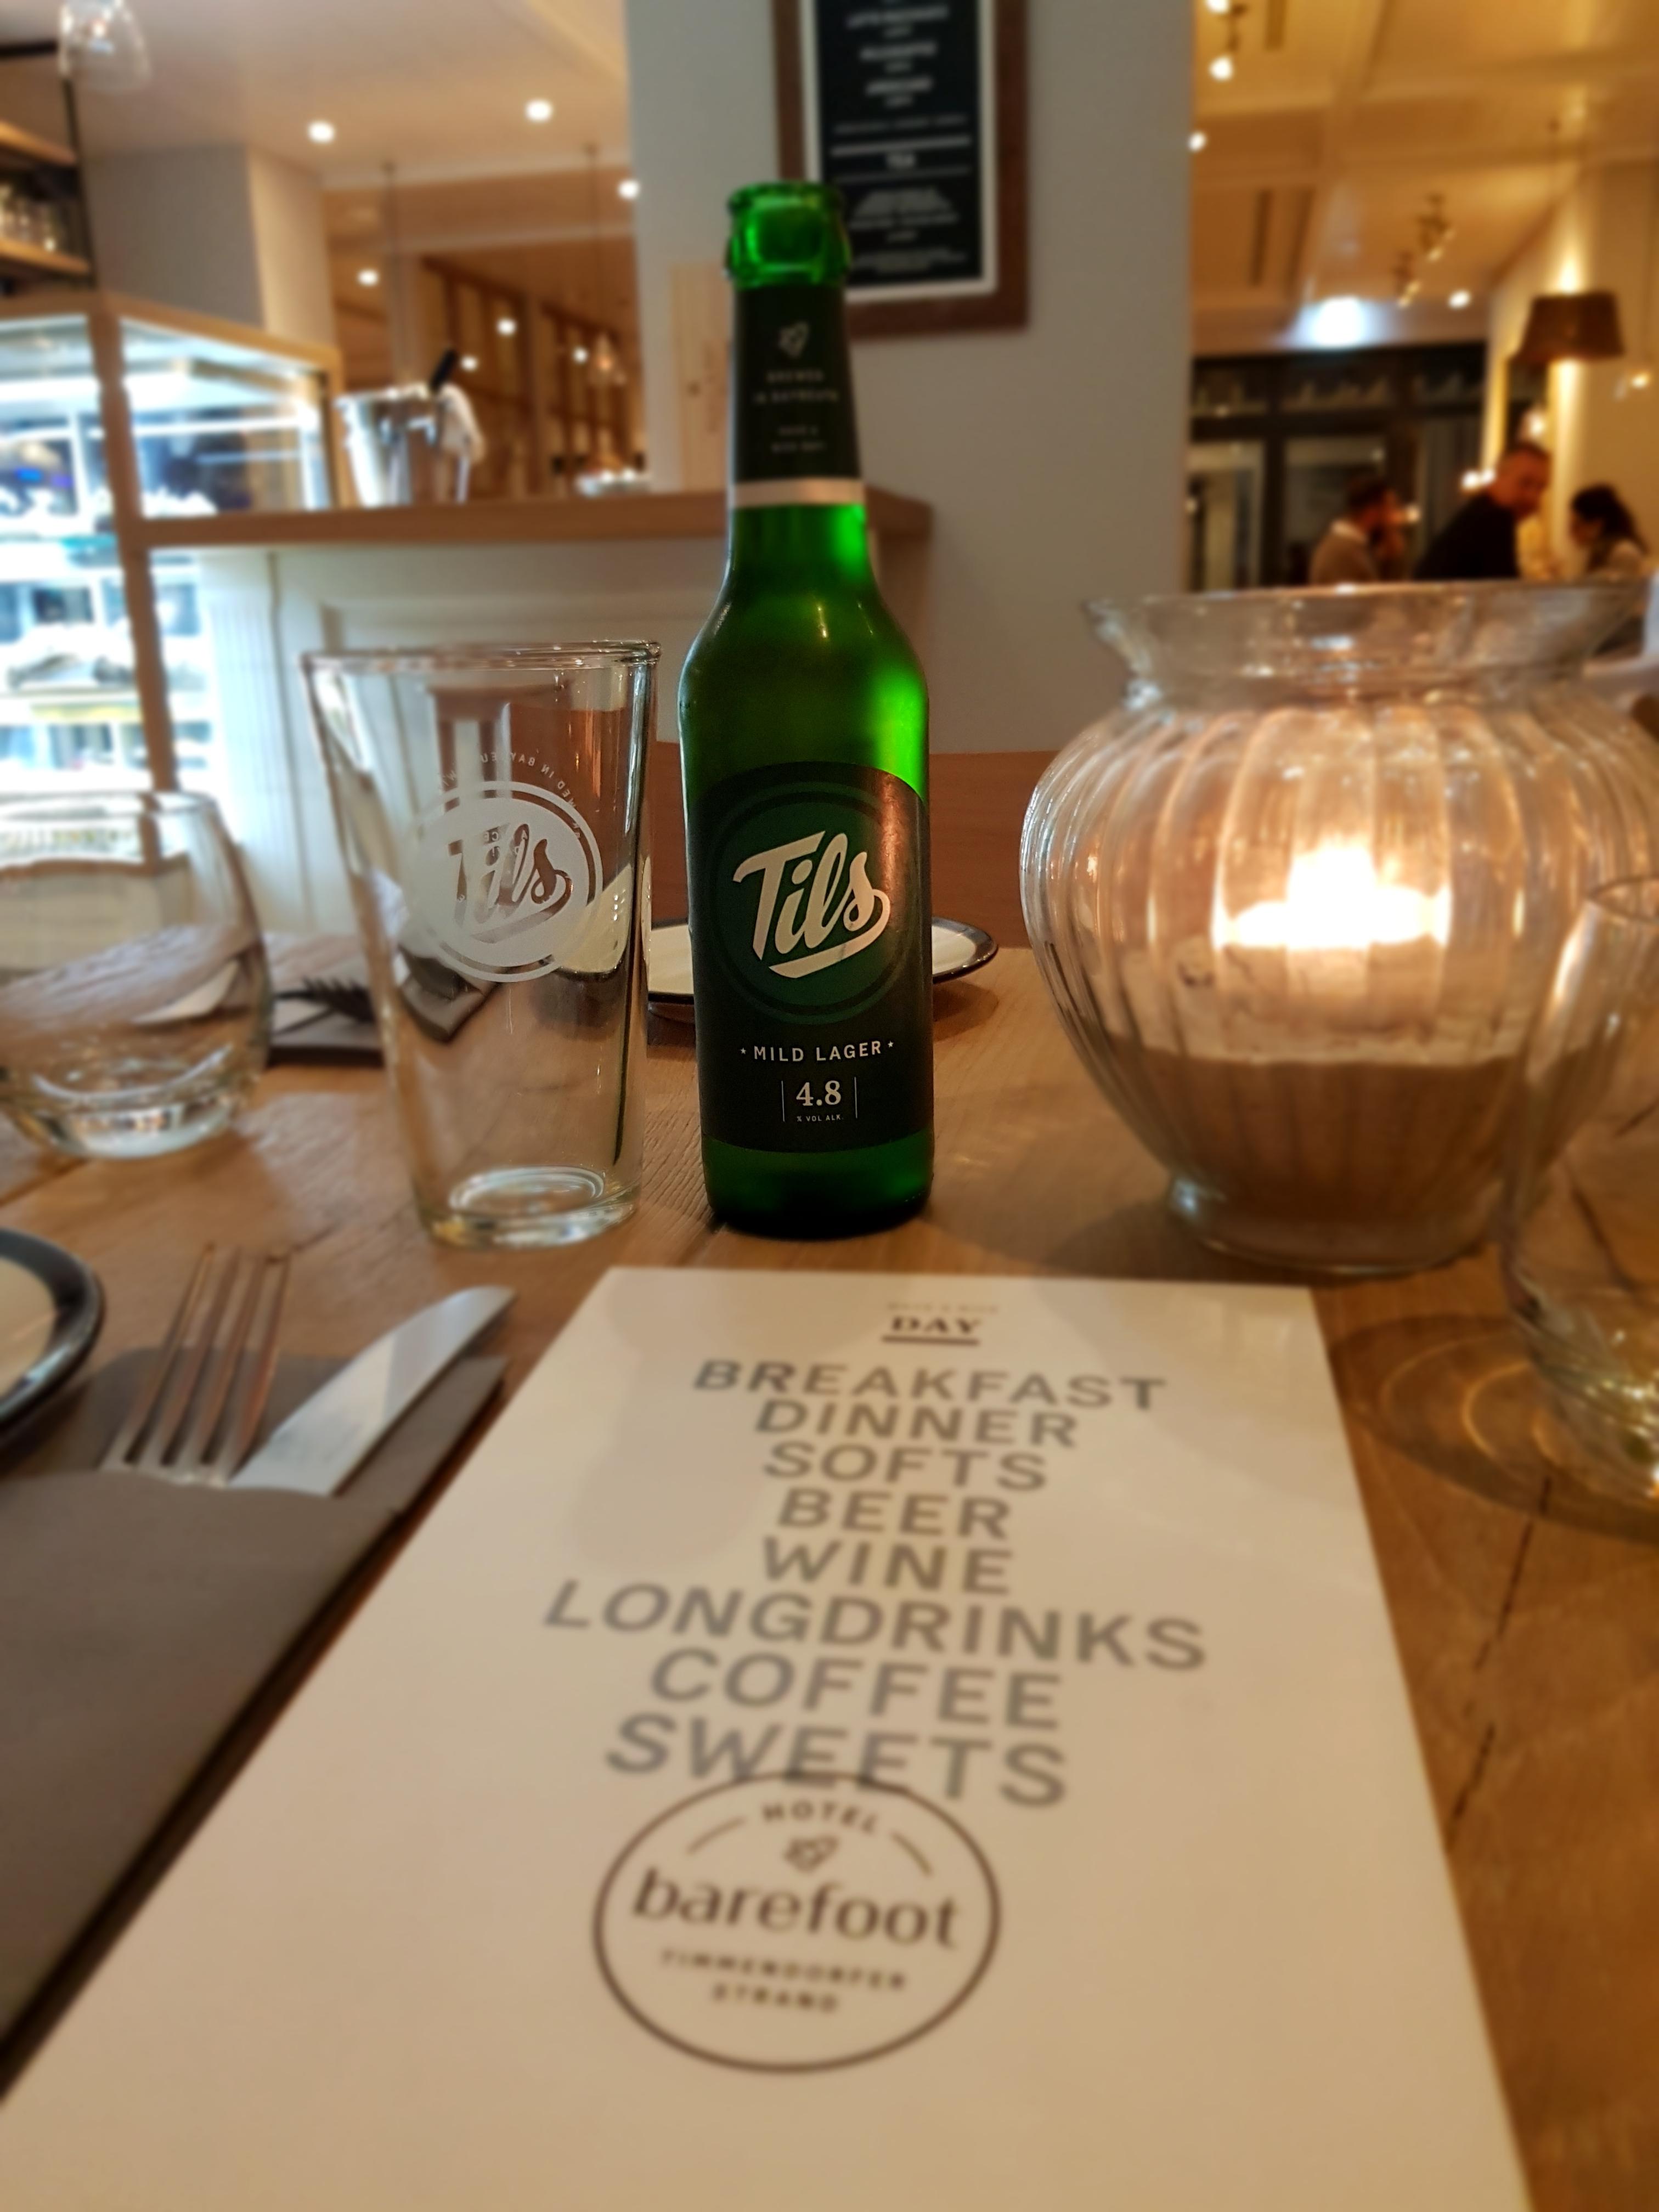 Tils Bier im Barefoot Restaurant